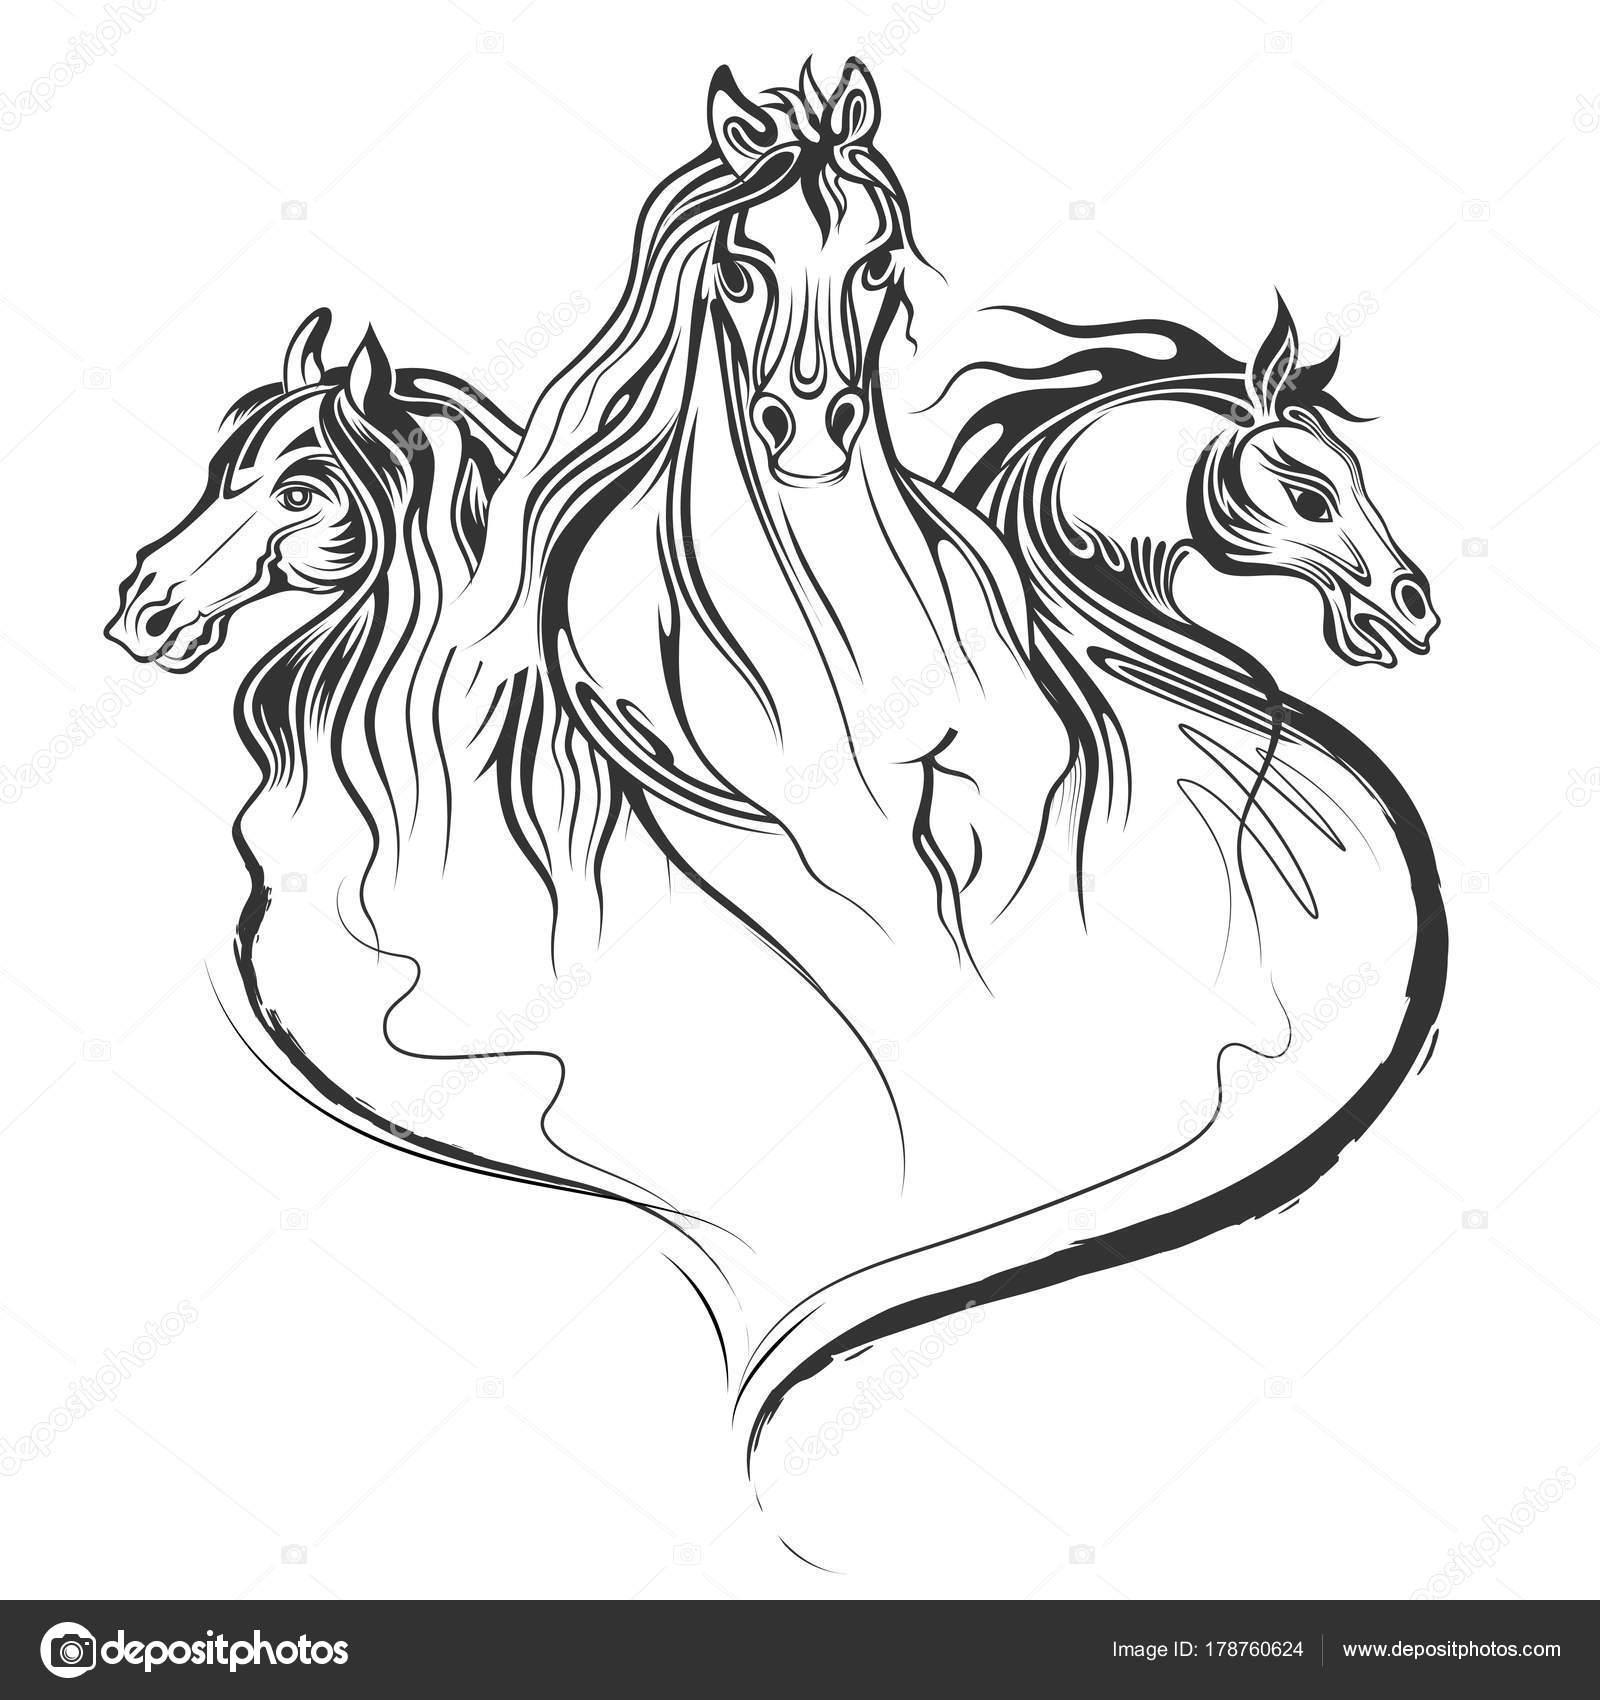 Horse Silhouette Tattoo Designs Tattoo Art Design Of Horse Racing In Line Art Stock Vector C Vectomart 178760624